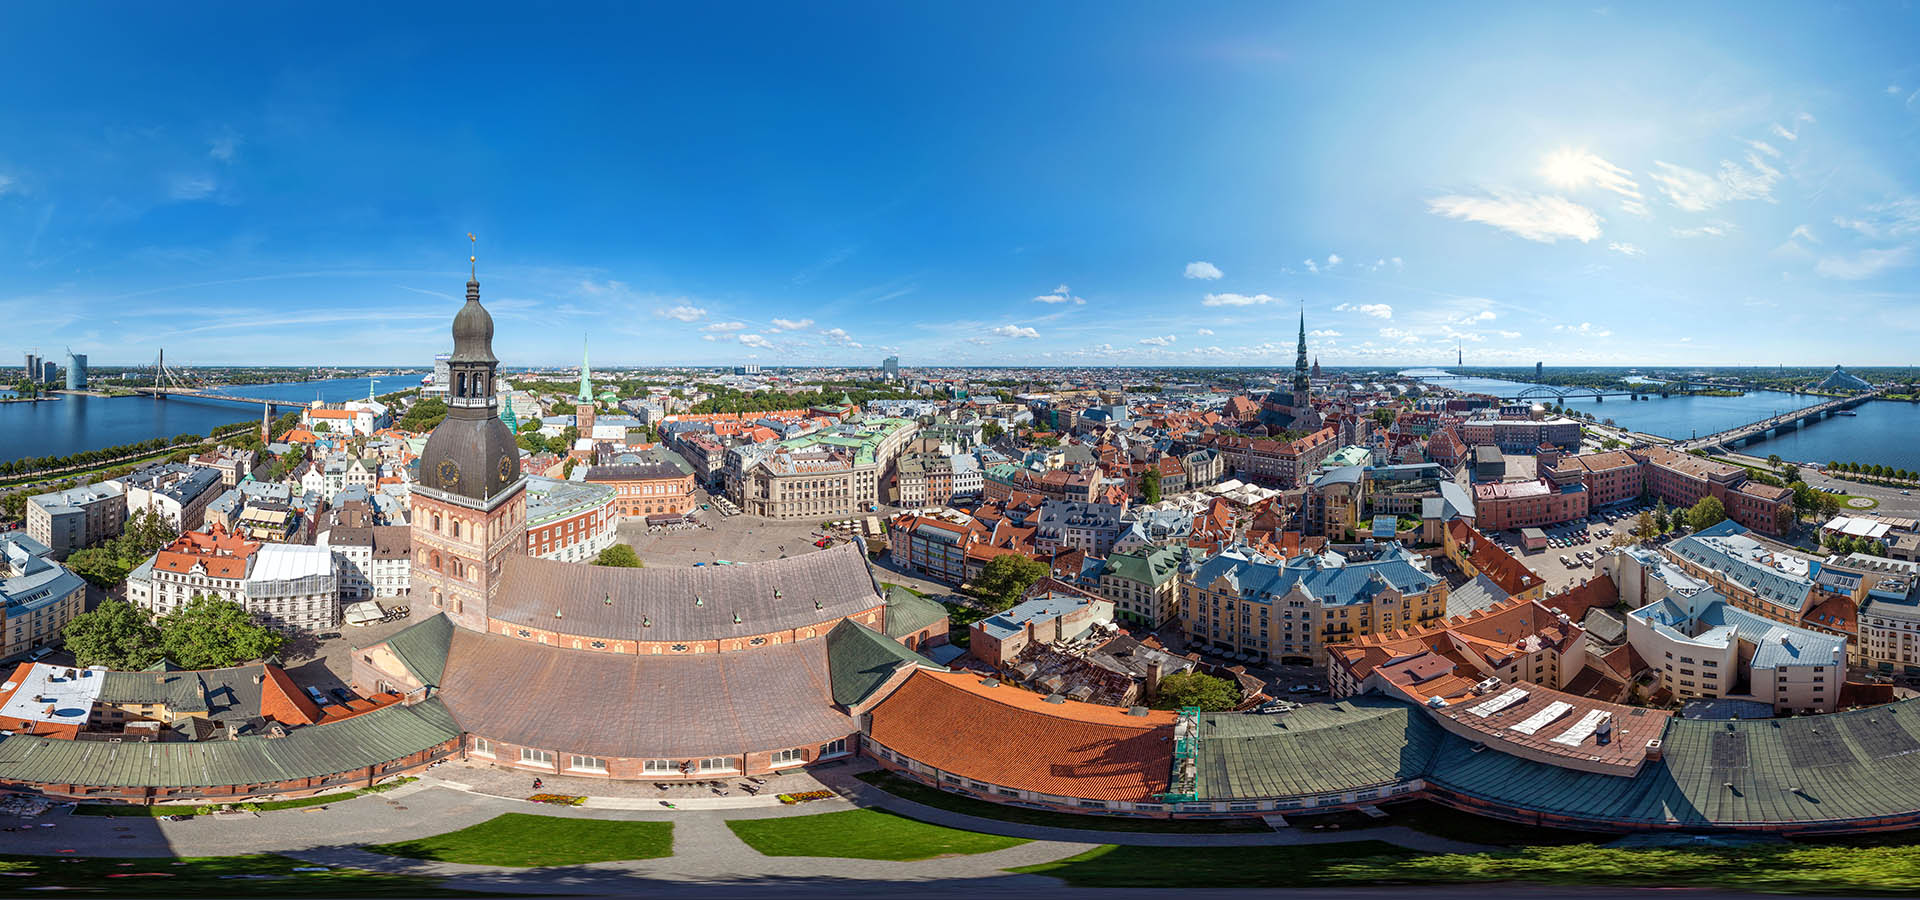 Old_Riga_Latvia_aerial_360_degree_panorama_OCEAN.LV_